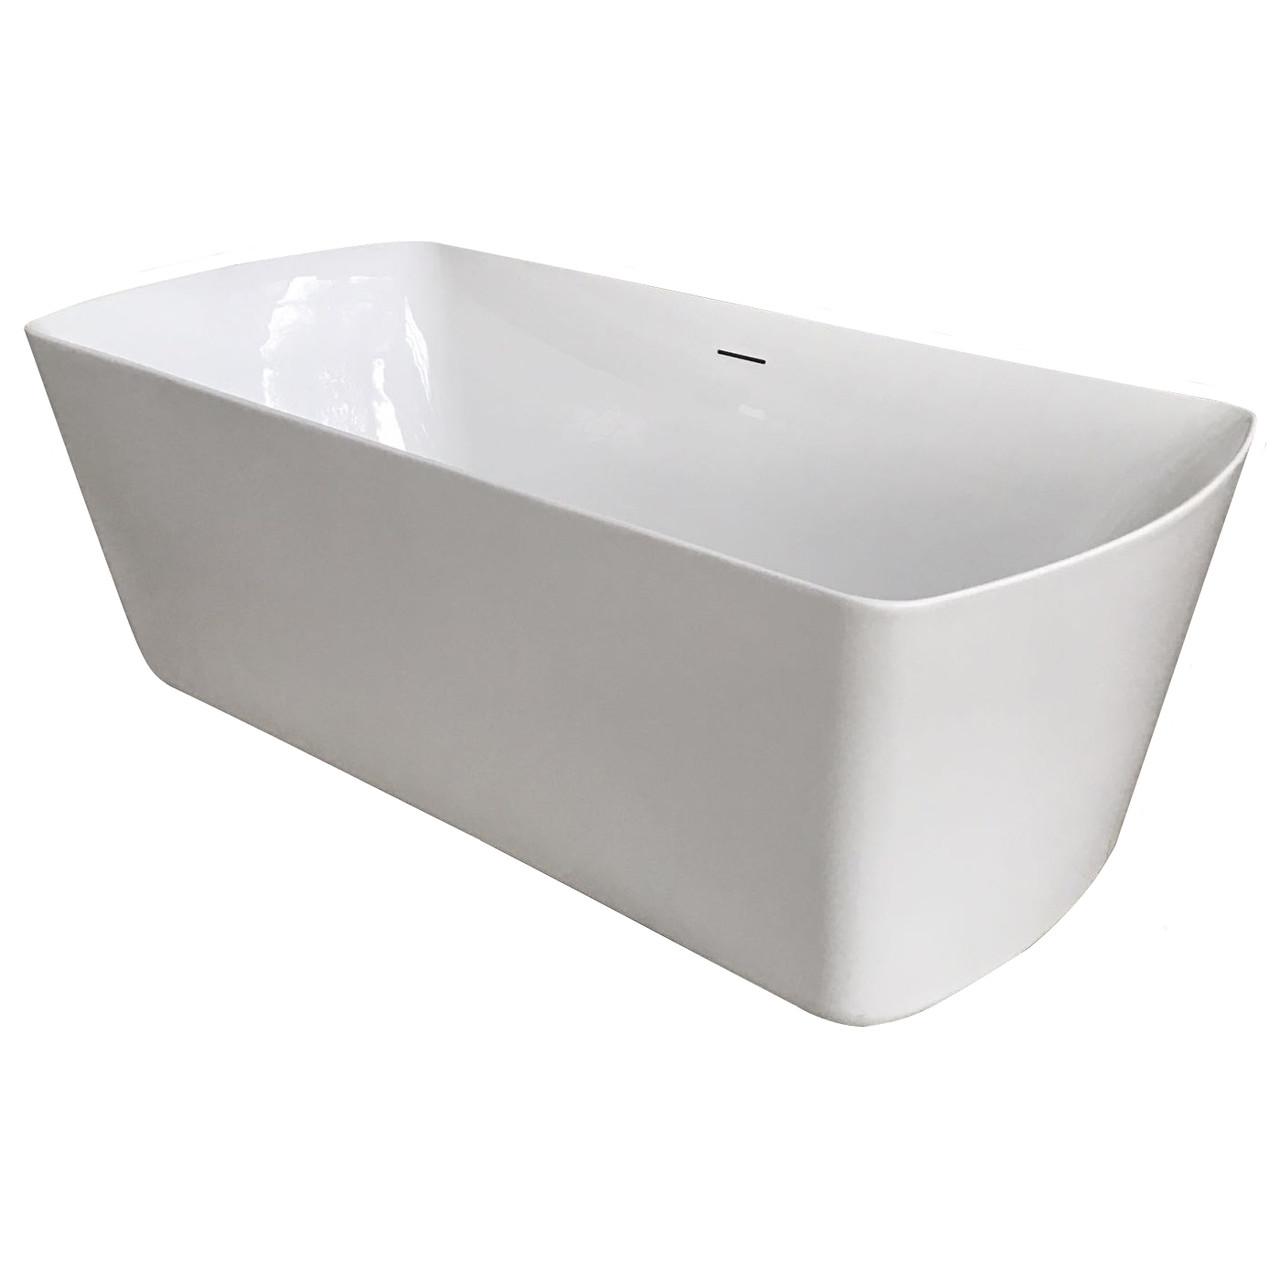 Ванна 180*85*61см, окремостояча, з сифоном